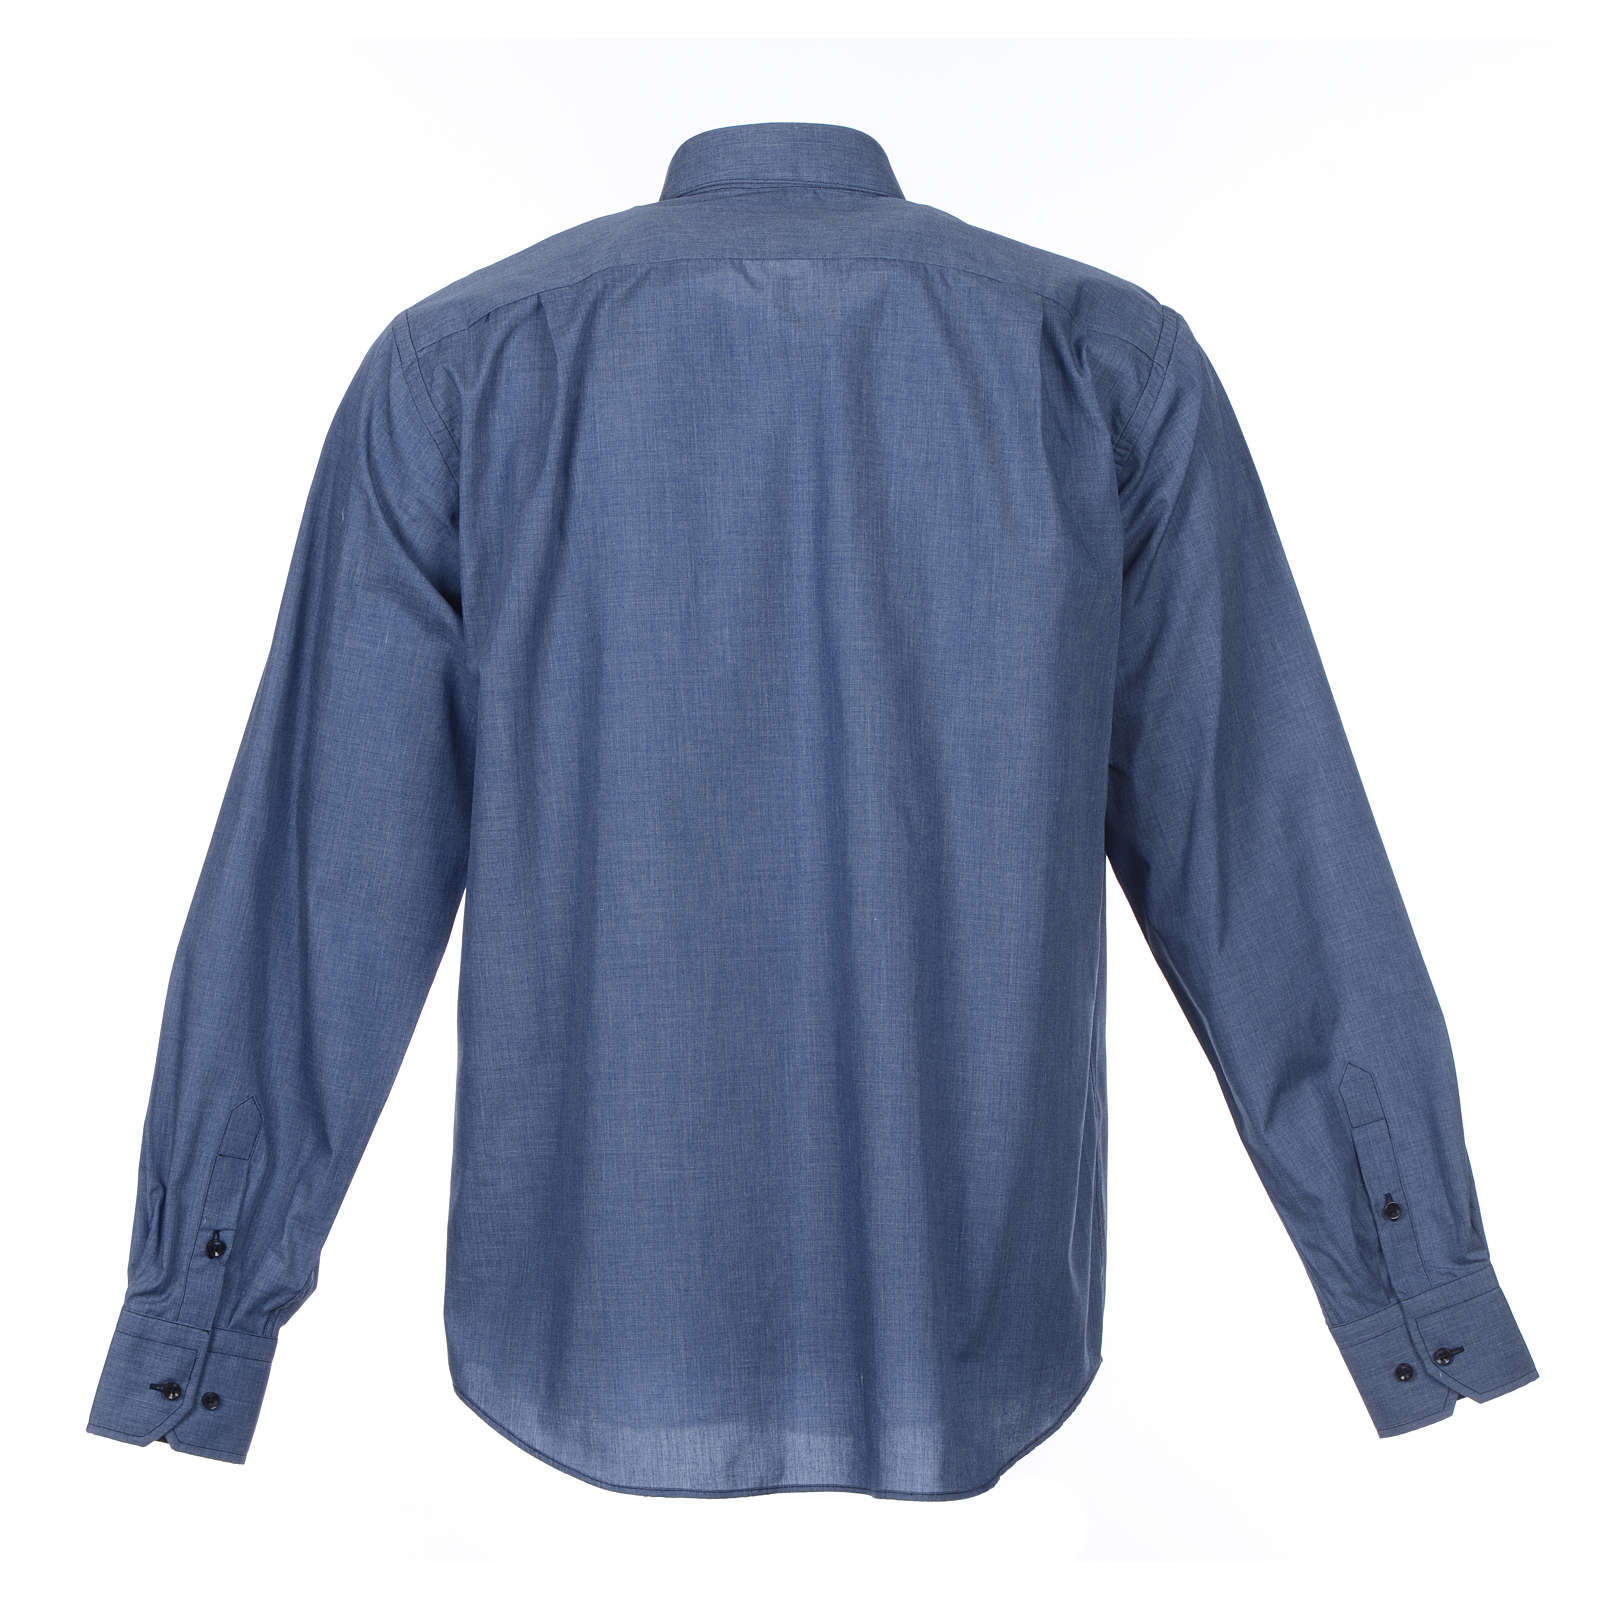 Camicia clergy M. Lunga tinta unita Misto cotone Jeans 4